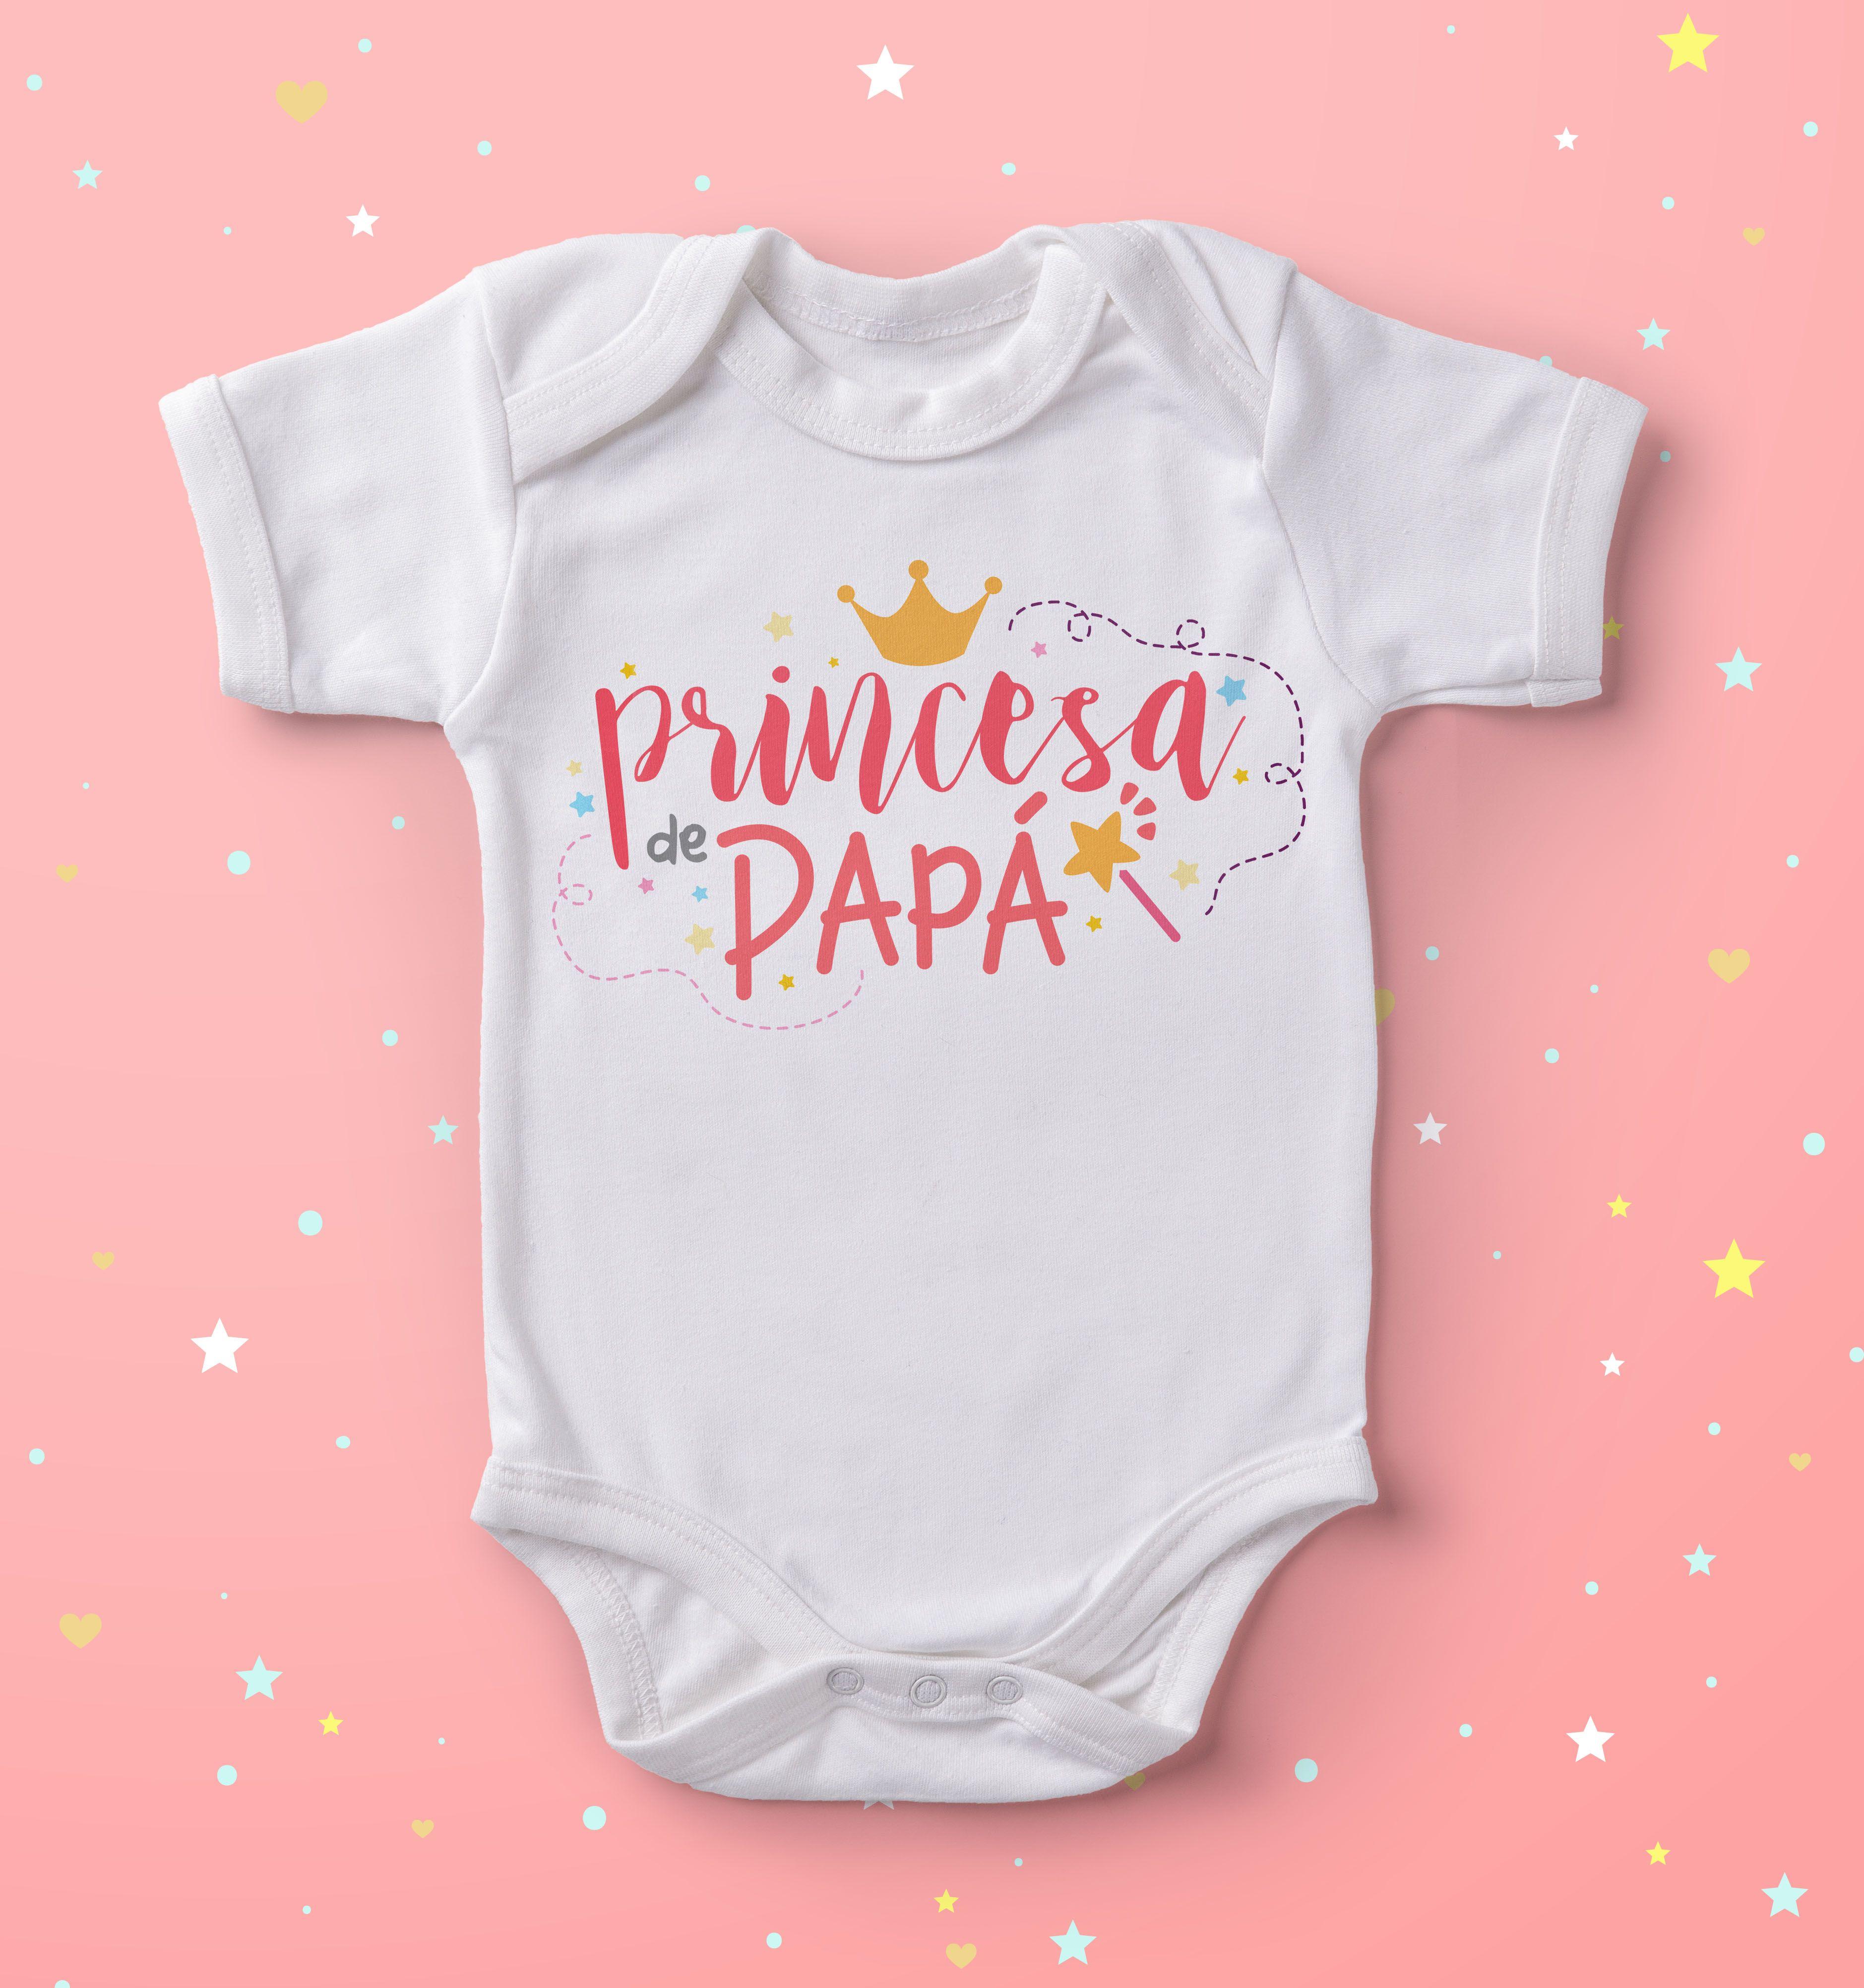 Body original para la princesa de papá.  bebes  babys  niños  maternidade 1d52a297d34